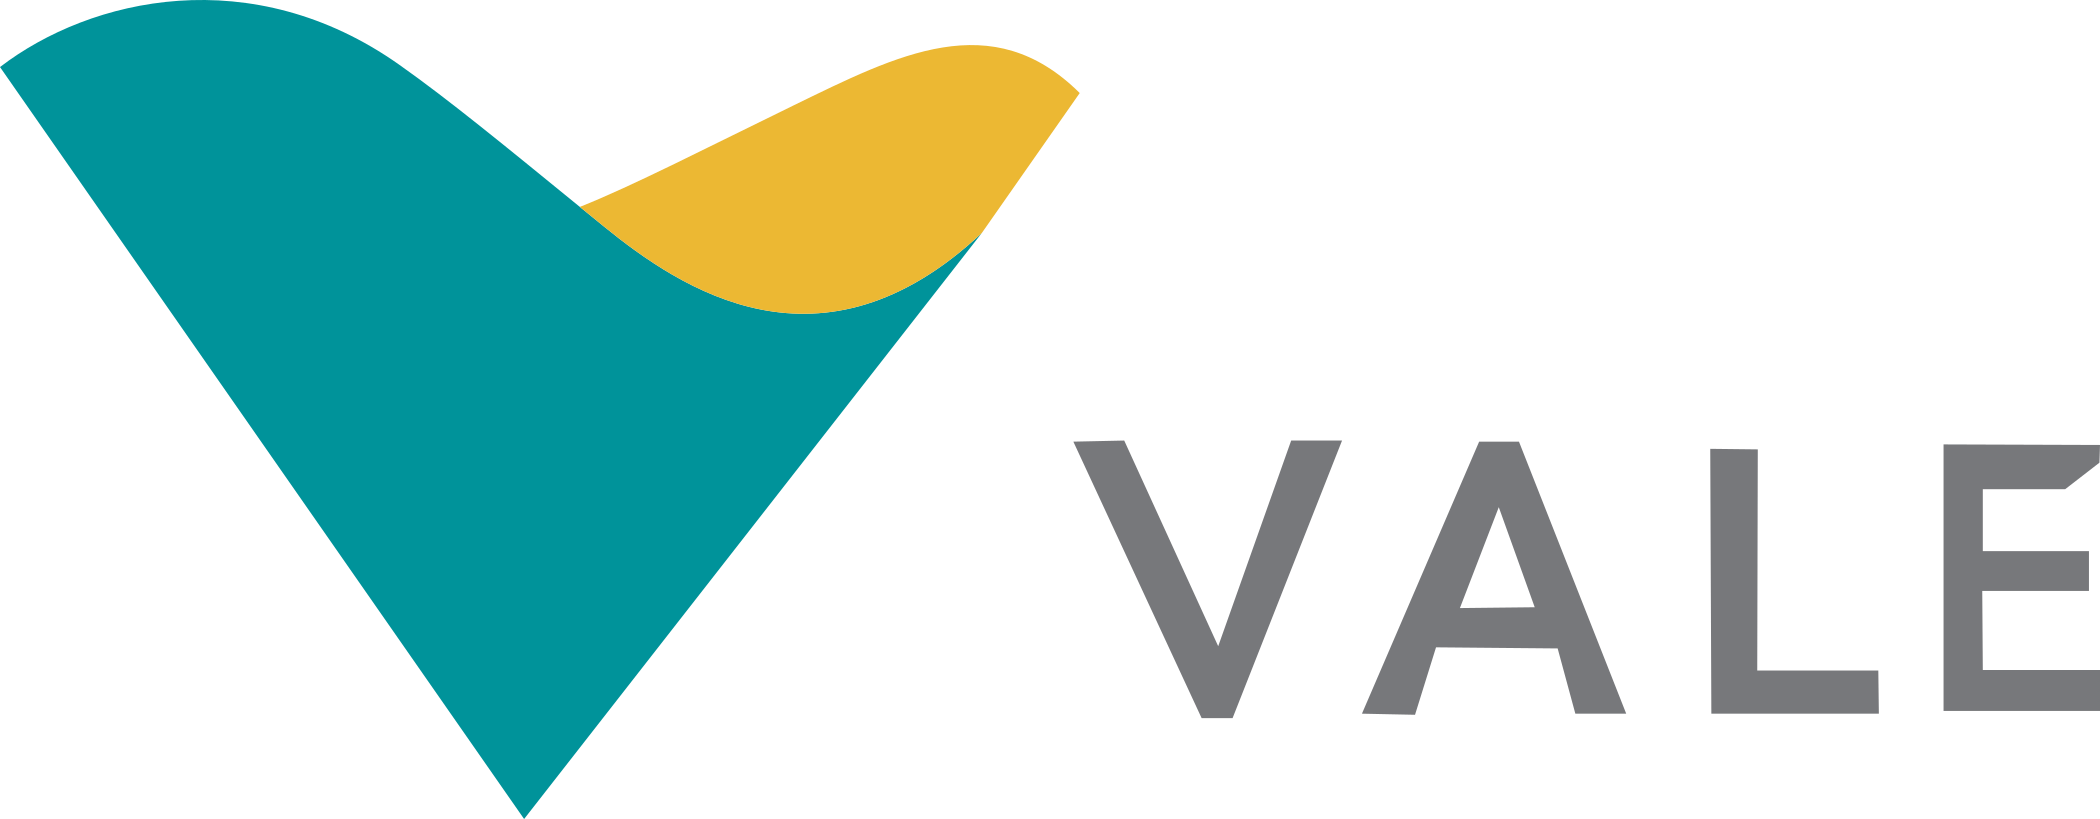 vale logo 1 1 - Vale Logo - Mineradora